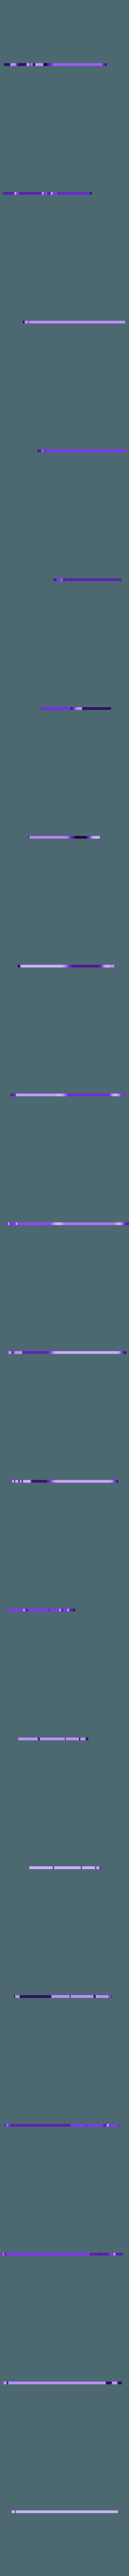 Escuadra_10_cm_v1.stl Download free STL file Shelf bracket set for single track slot • 3D printer design, dancingchicken